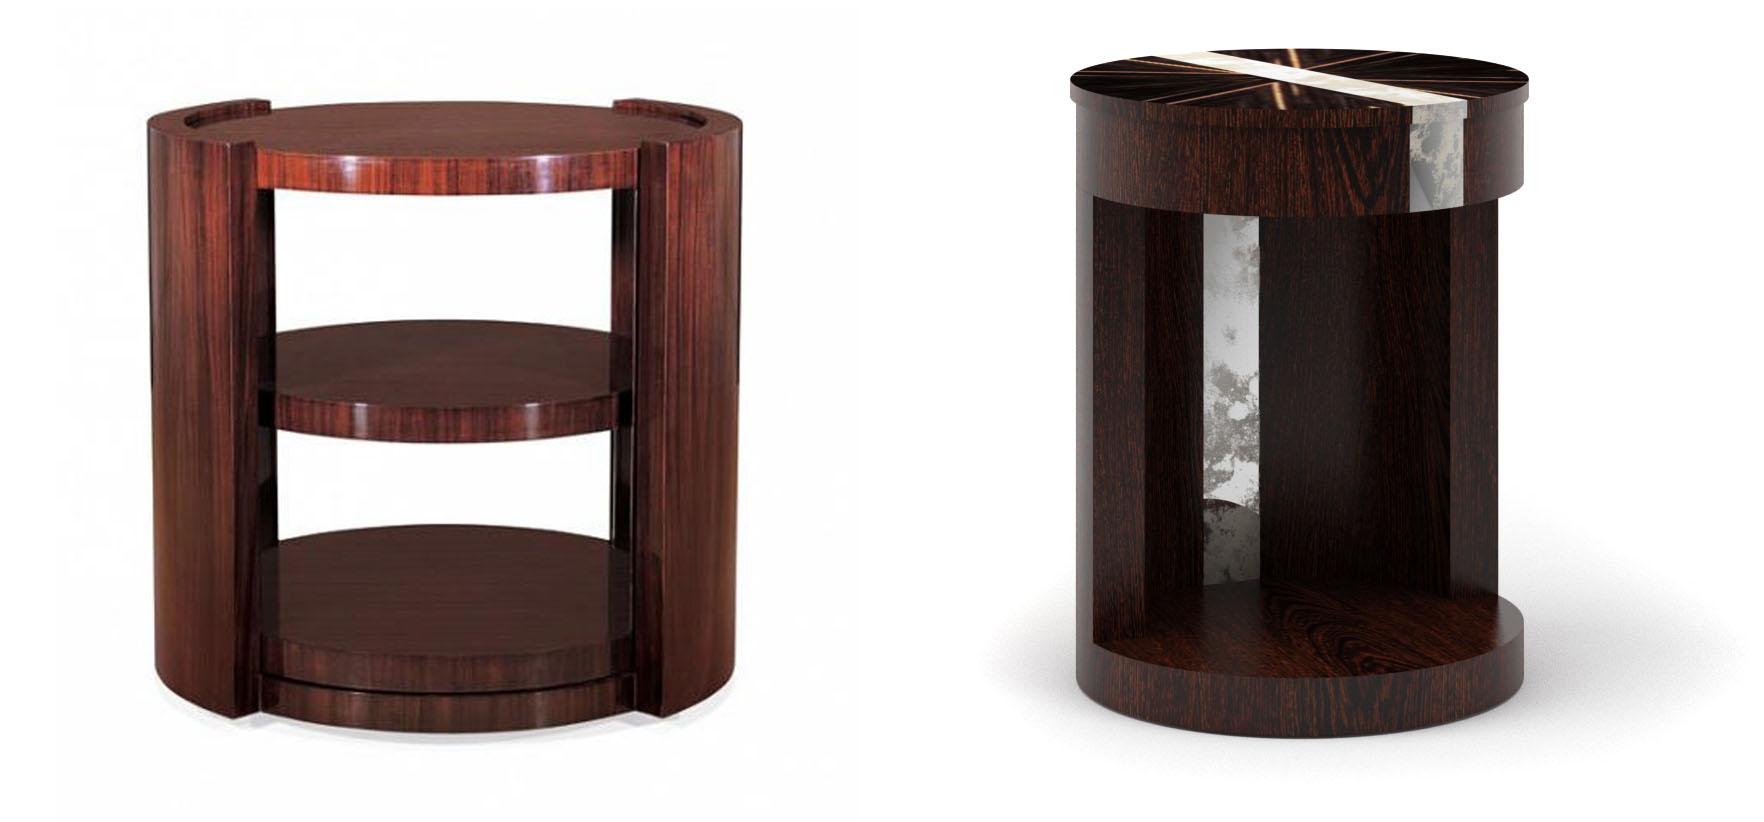 Accouter_-Design-Side-table-Custom-Decca-furniture